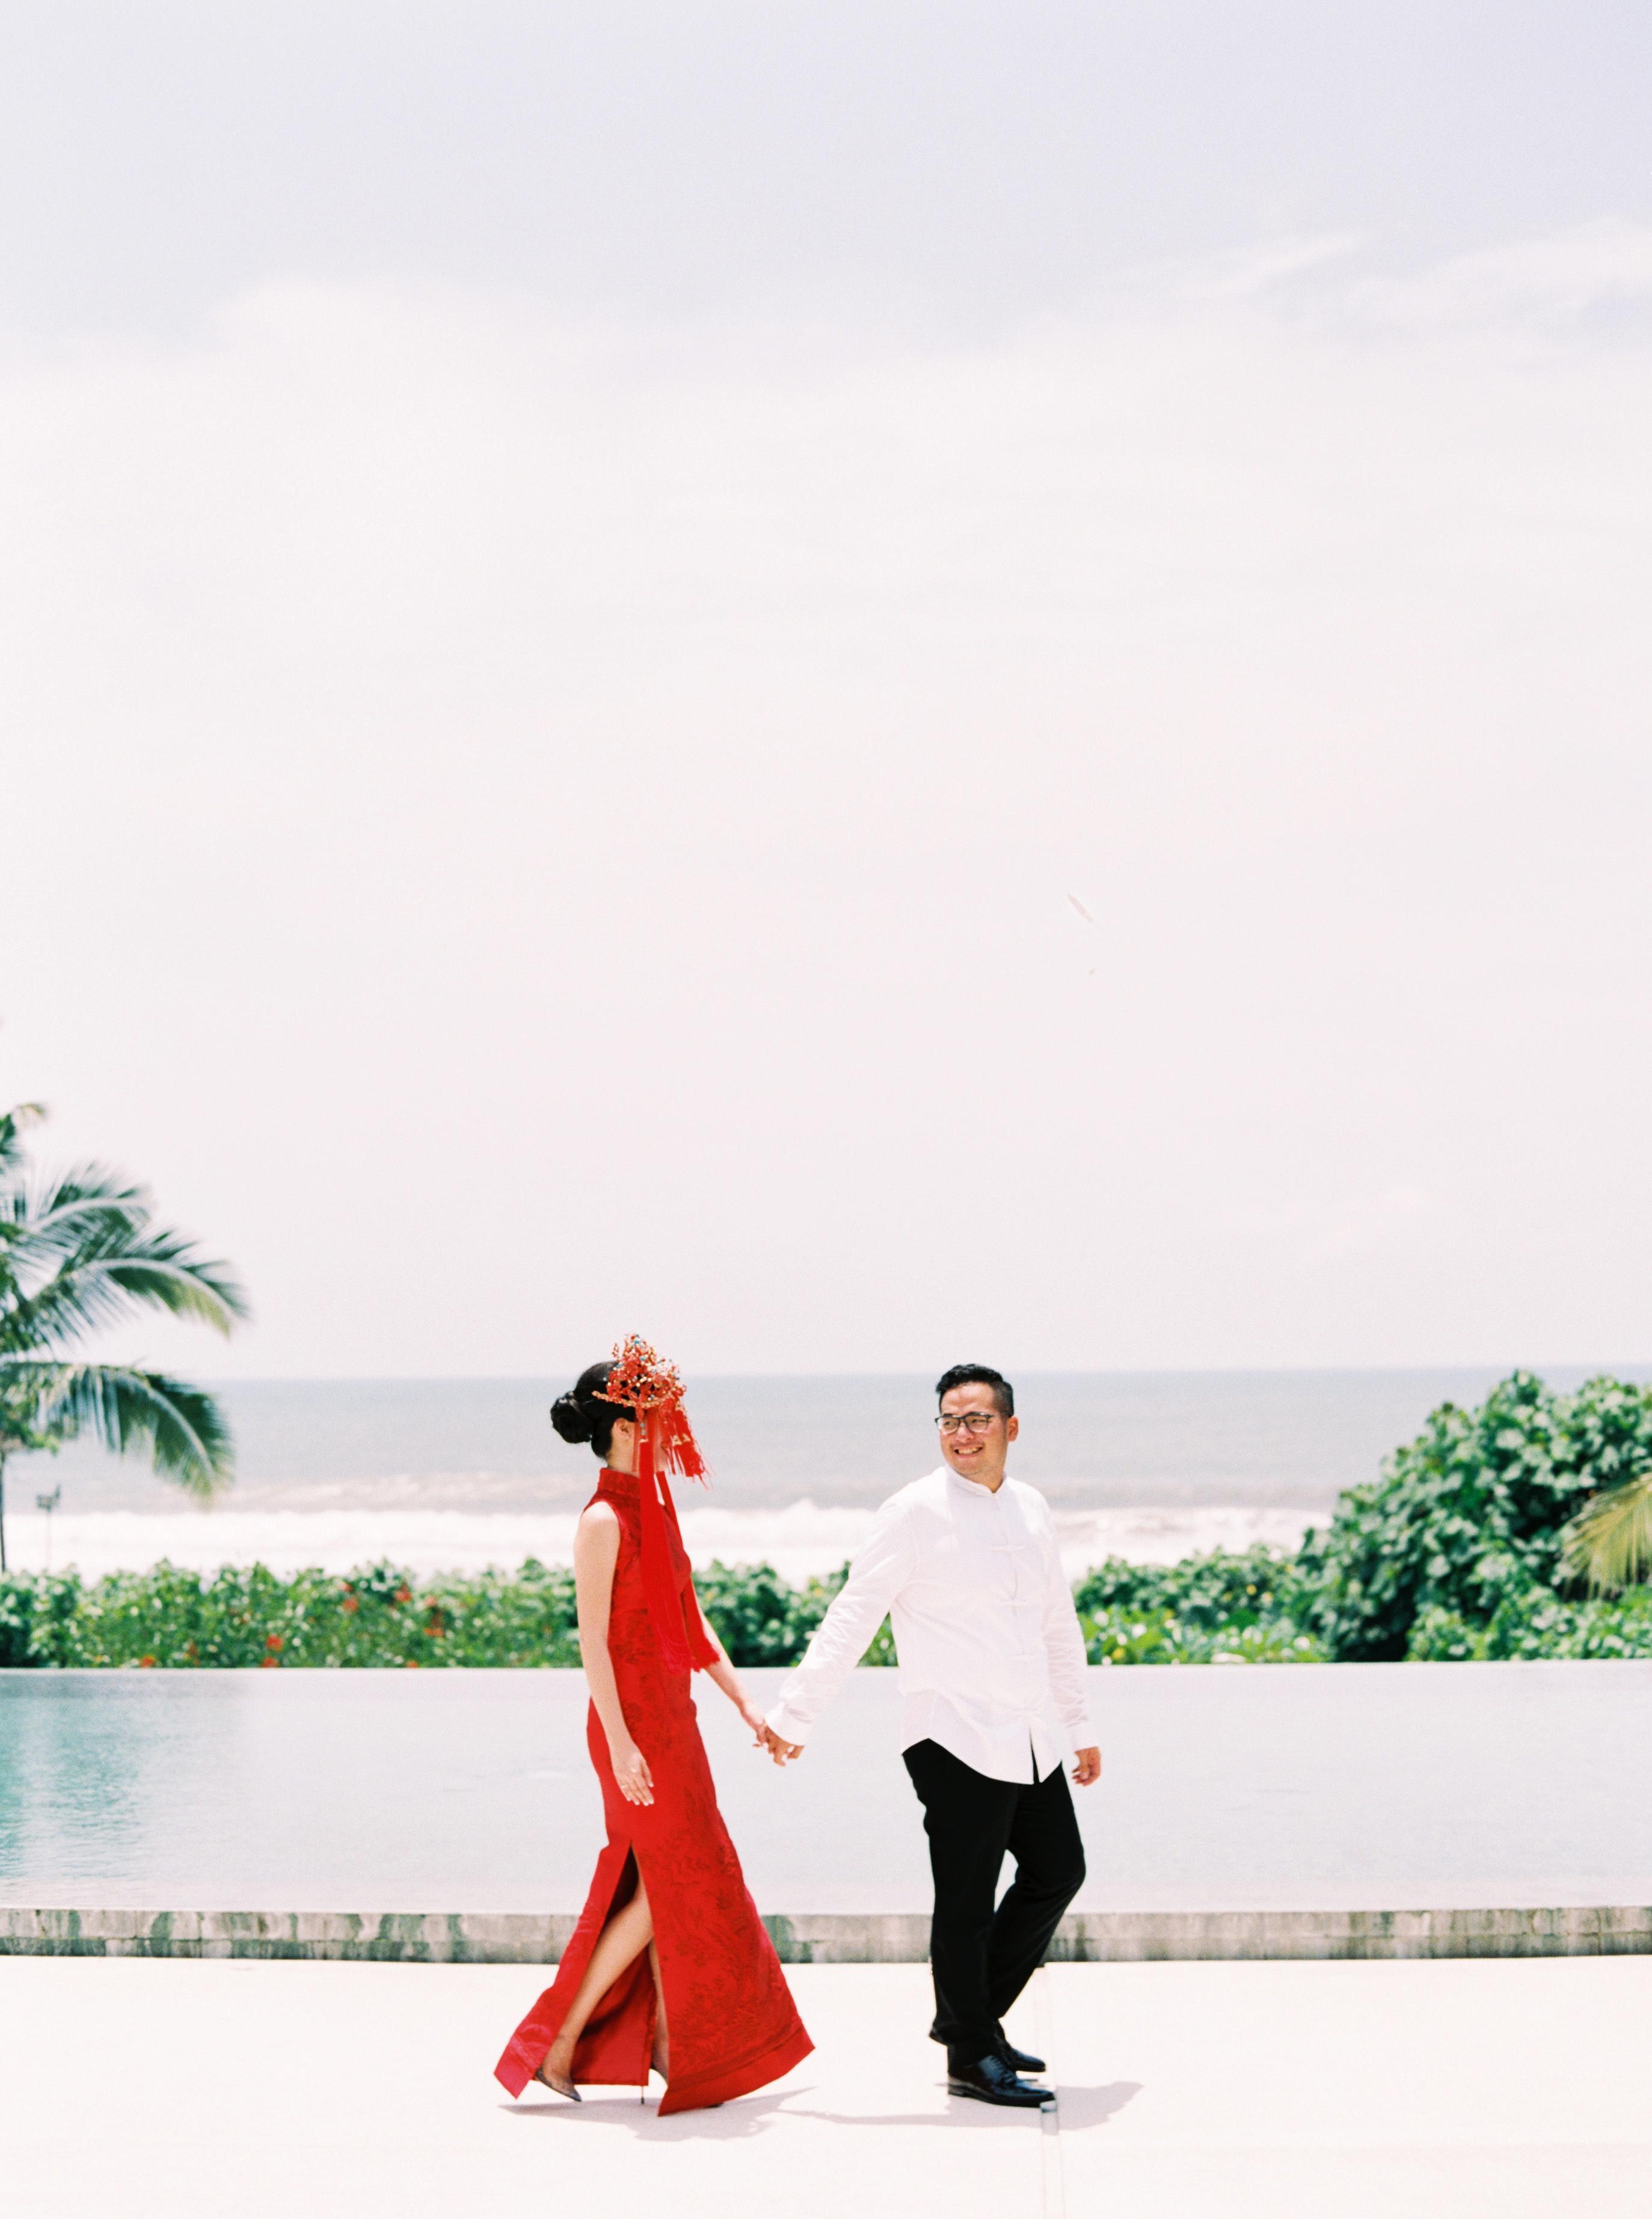 vivi yoga bali wedding ceremony couple red dress